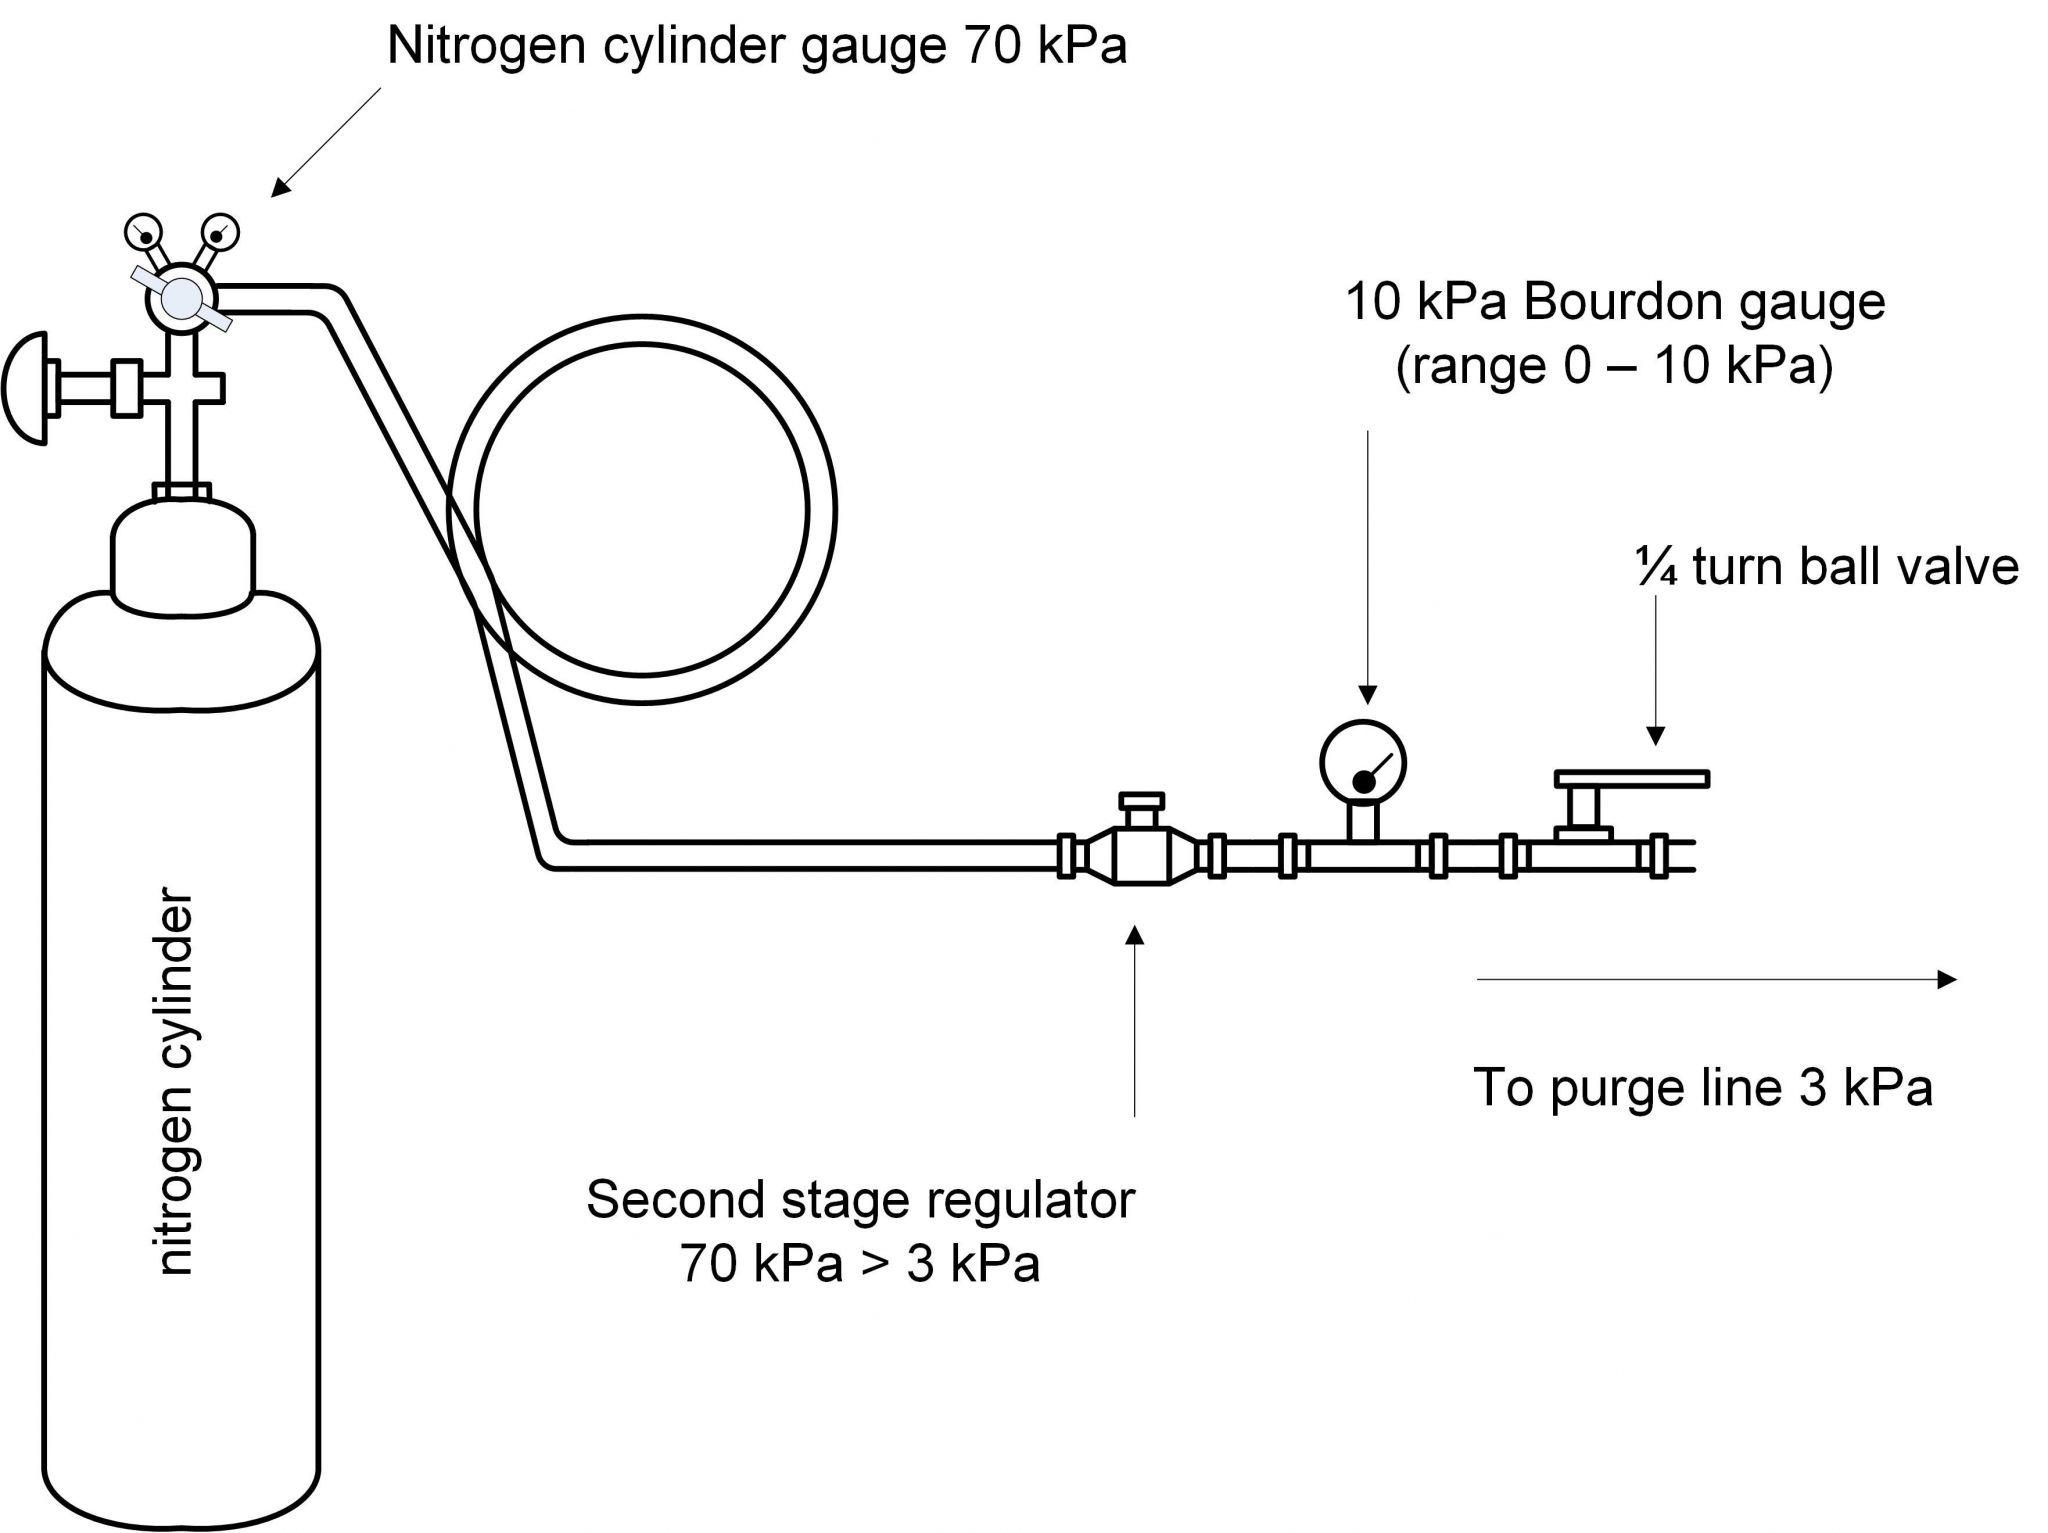 Unit 2 Worksheet 2 Measuring Pressure